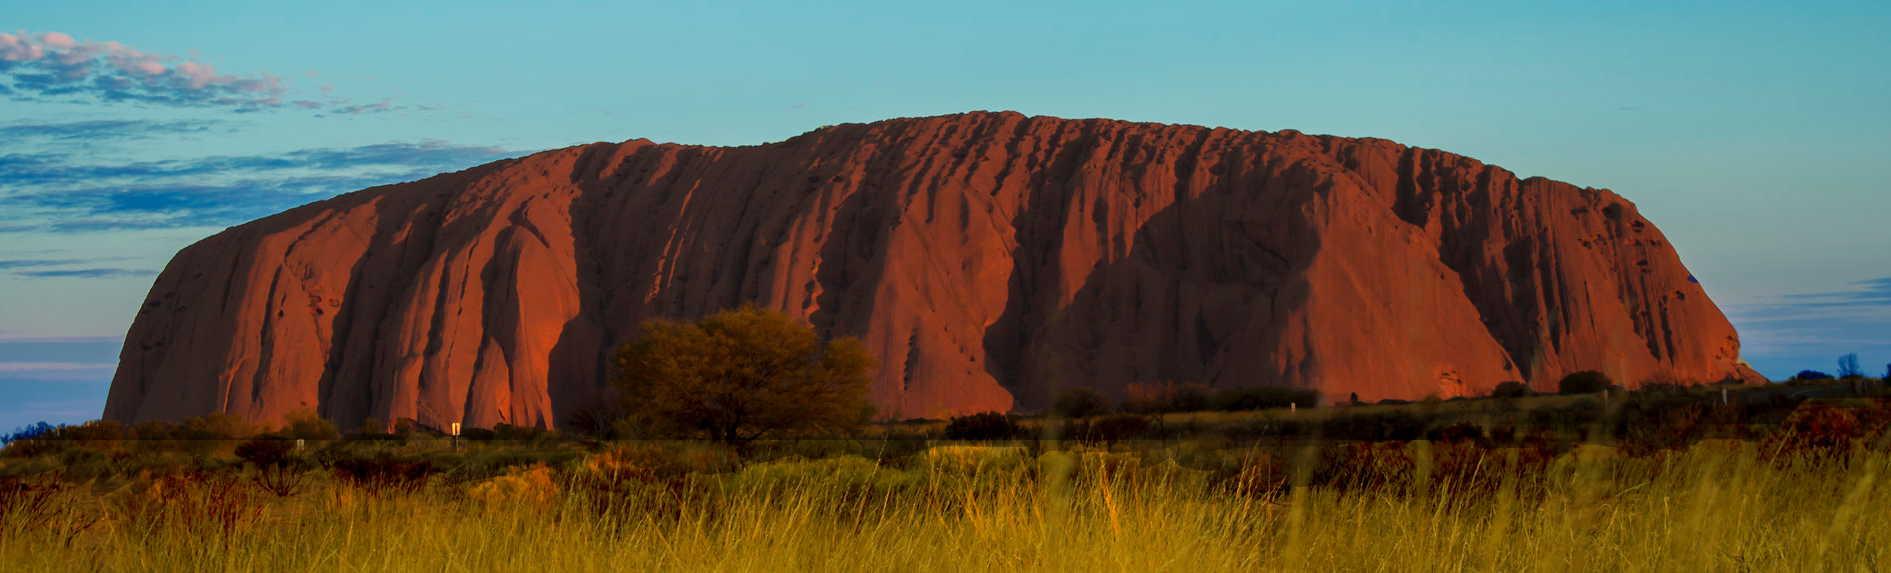 11 Fascinating Facts about Uluru